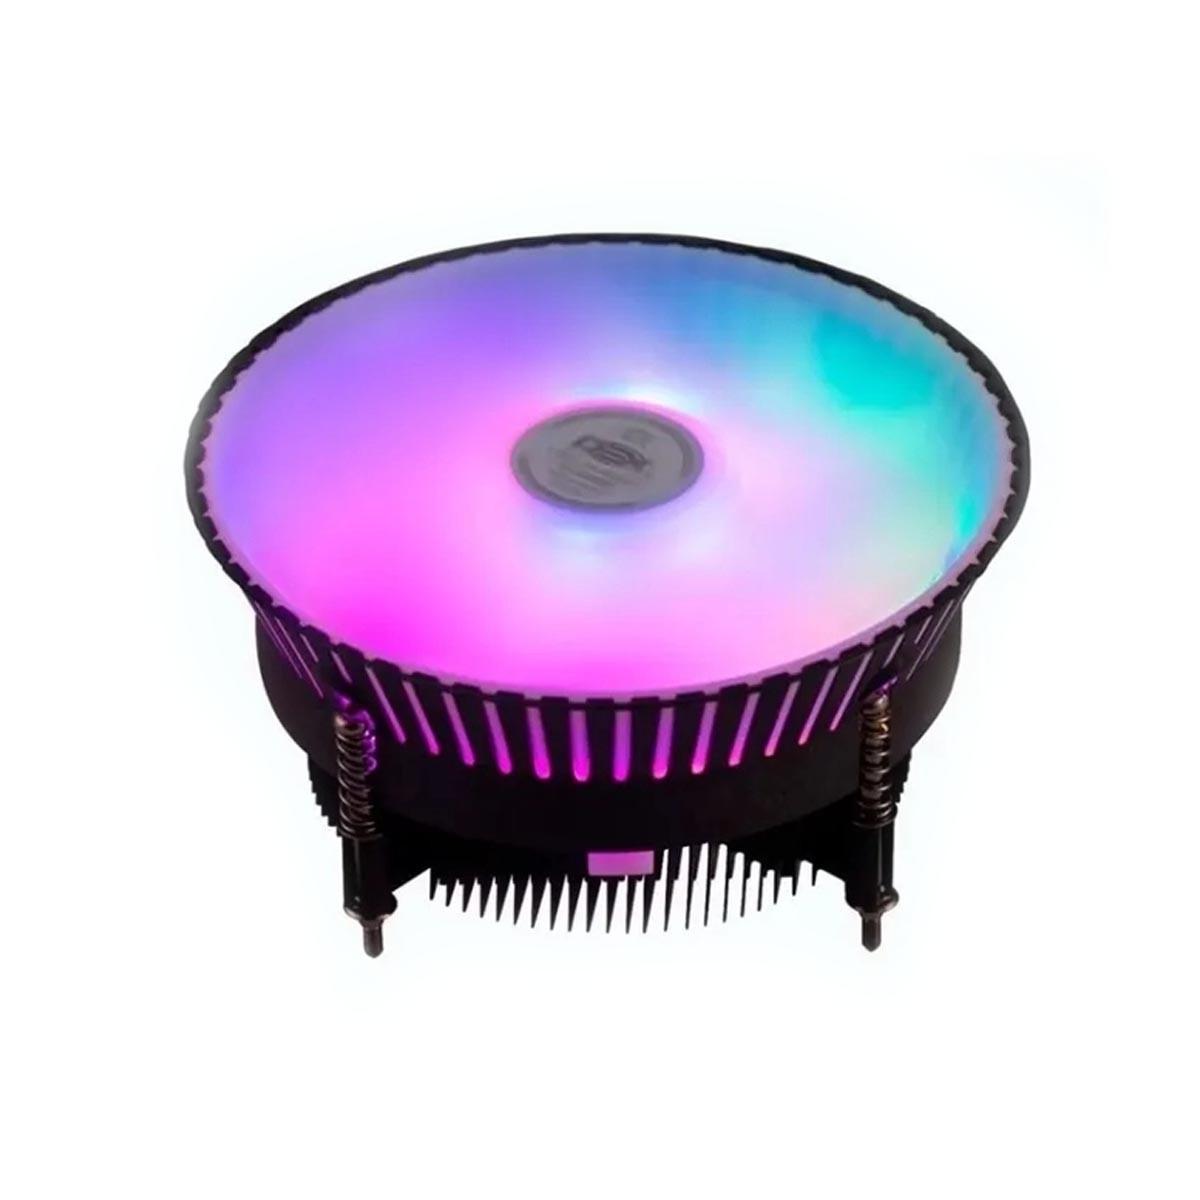 Cooler Parafusado DEX P/ Processador Linha Lga 115x C/6 Led Argb - Dx-9007